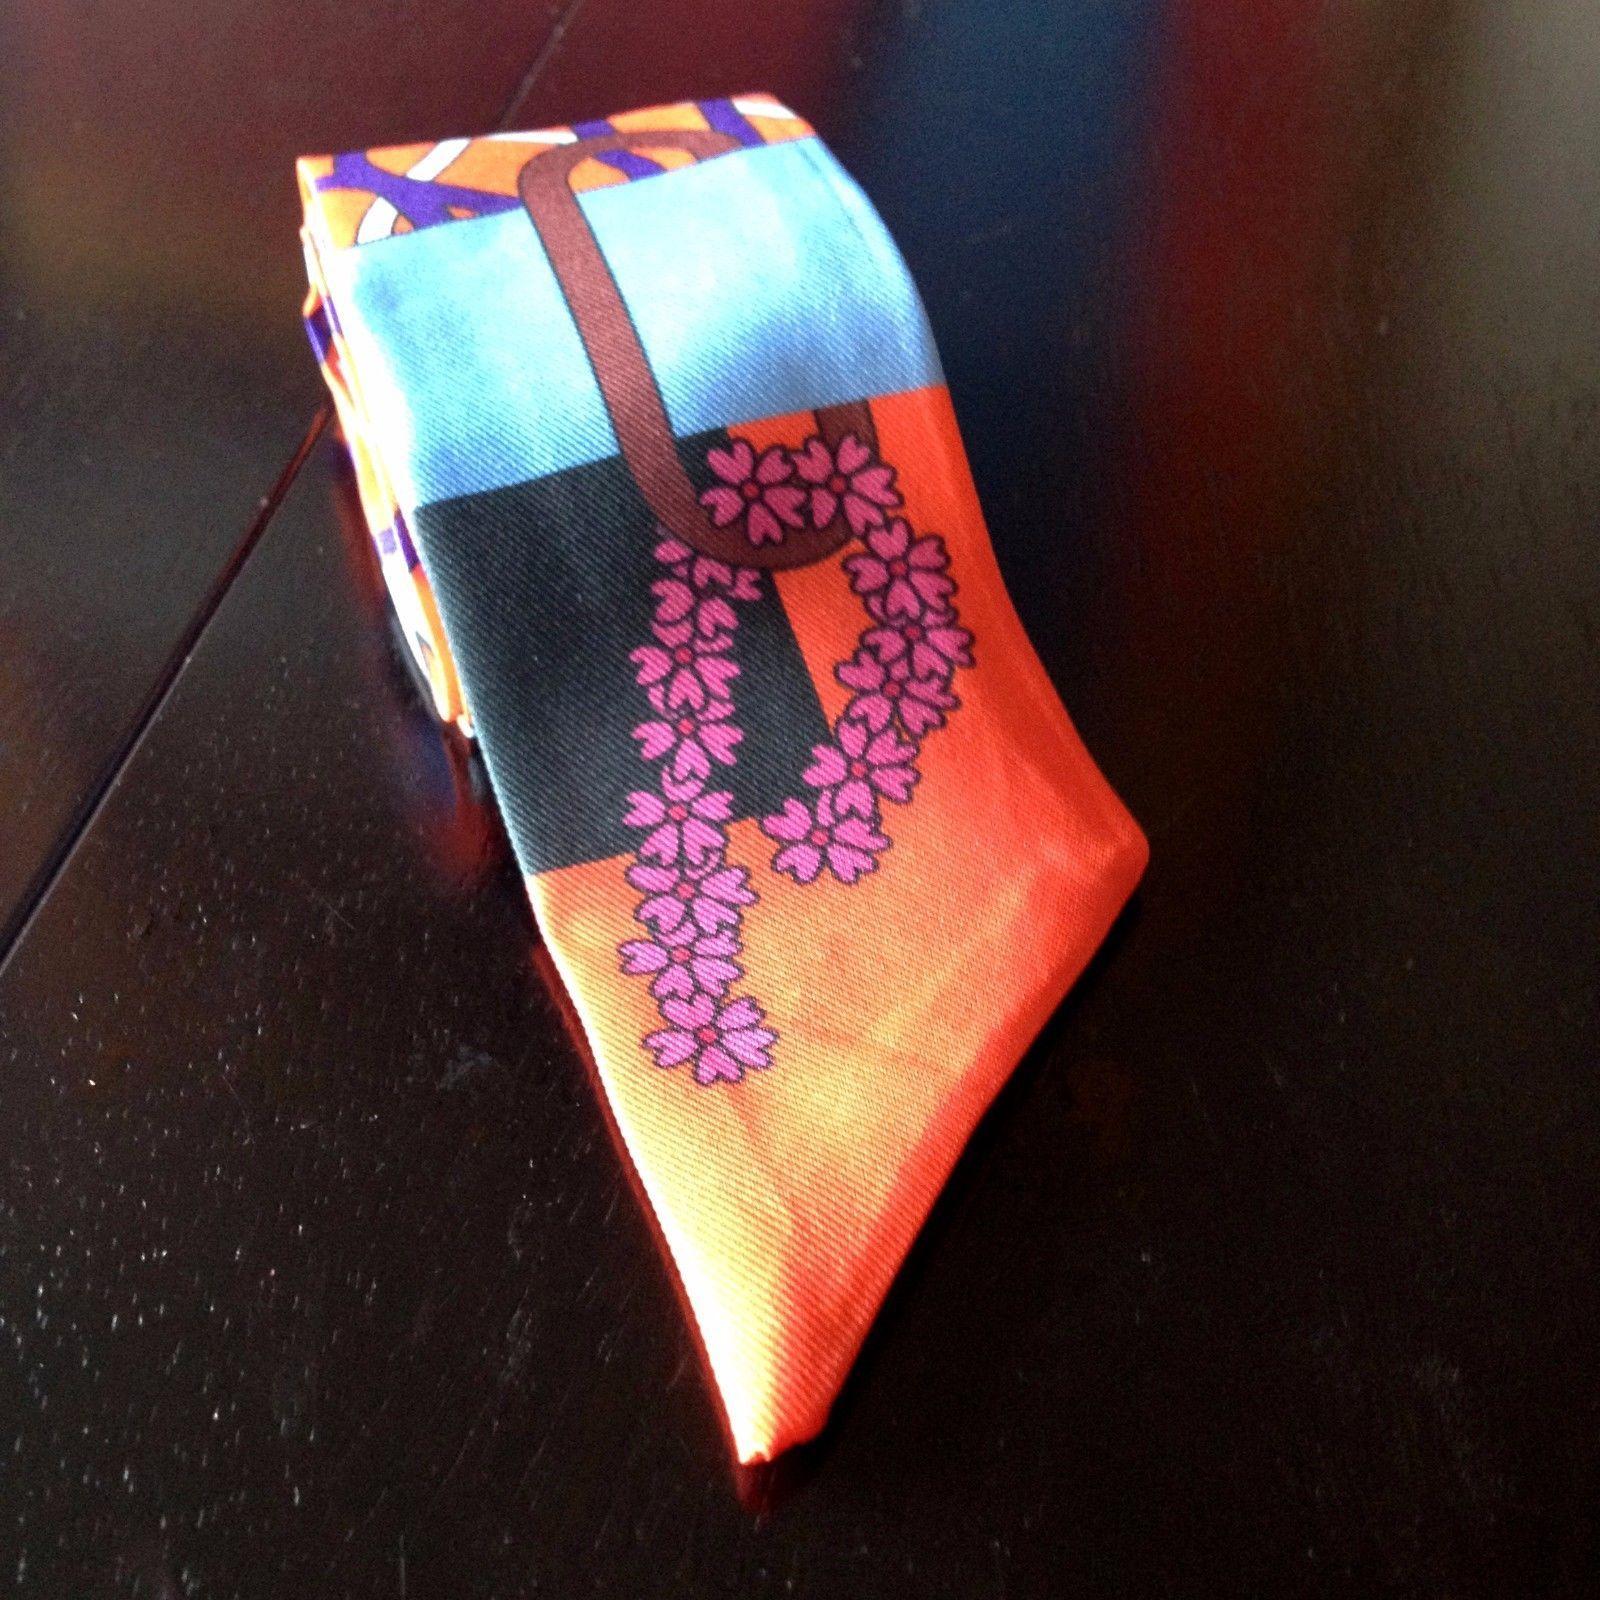 St. Germain Luxury Twilly Scarf Classic Orange Pink Blue Purse Handbag